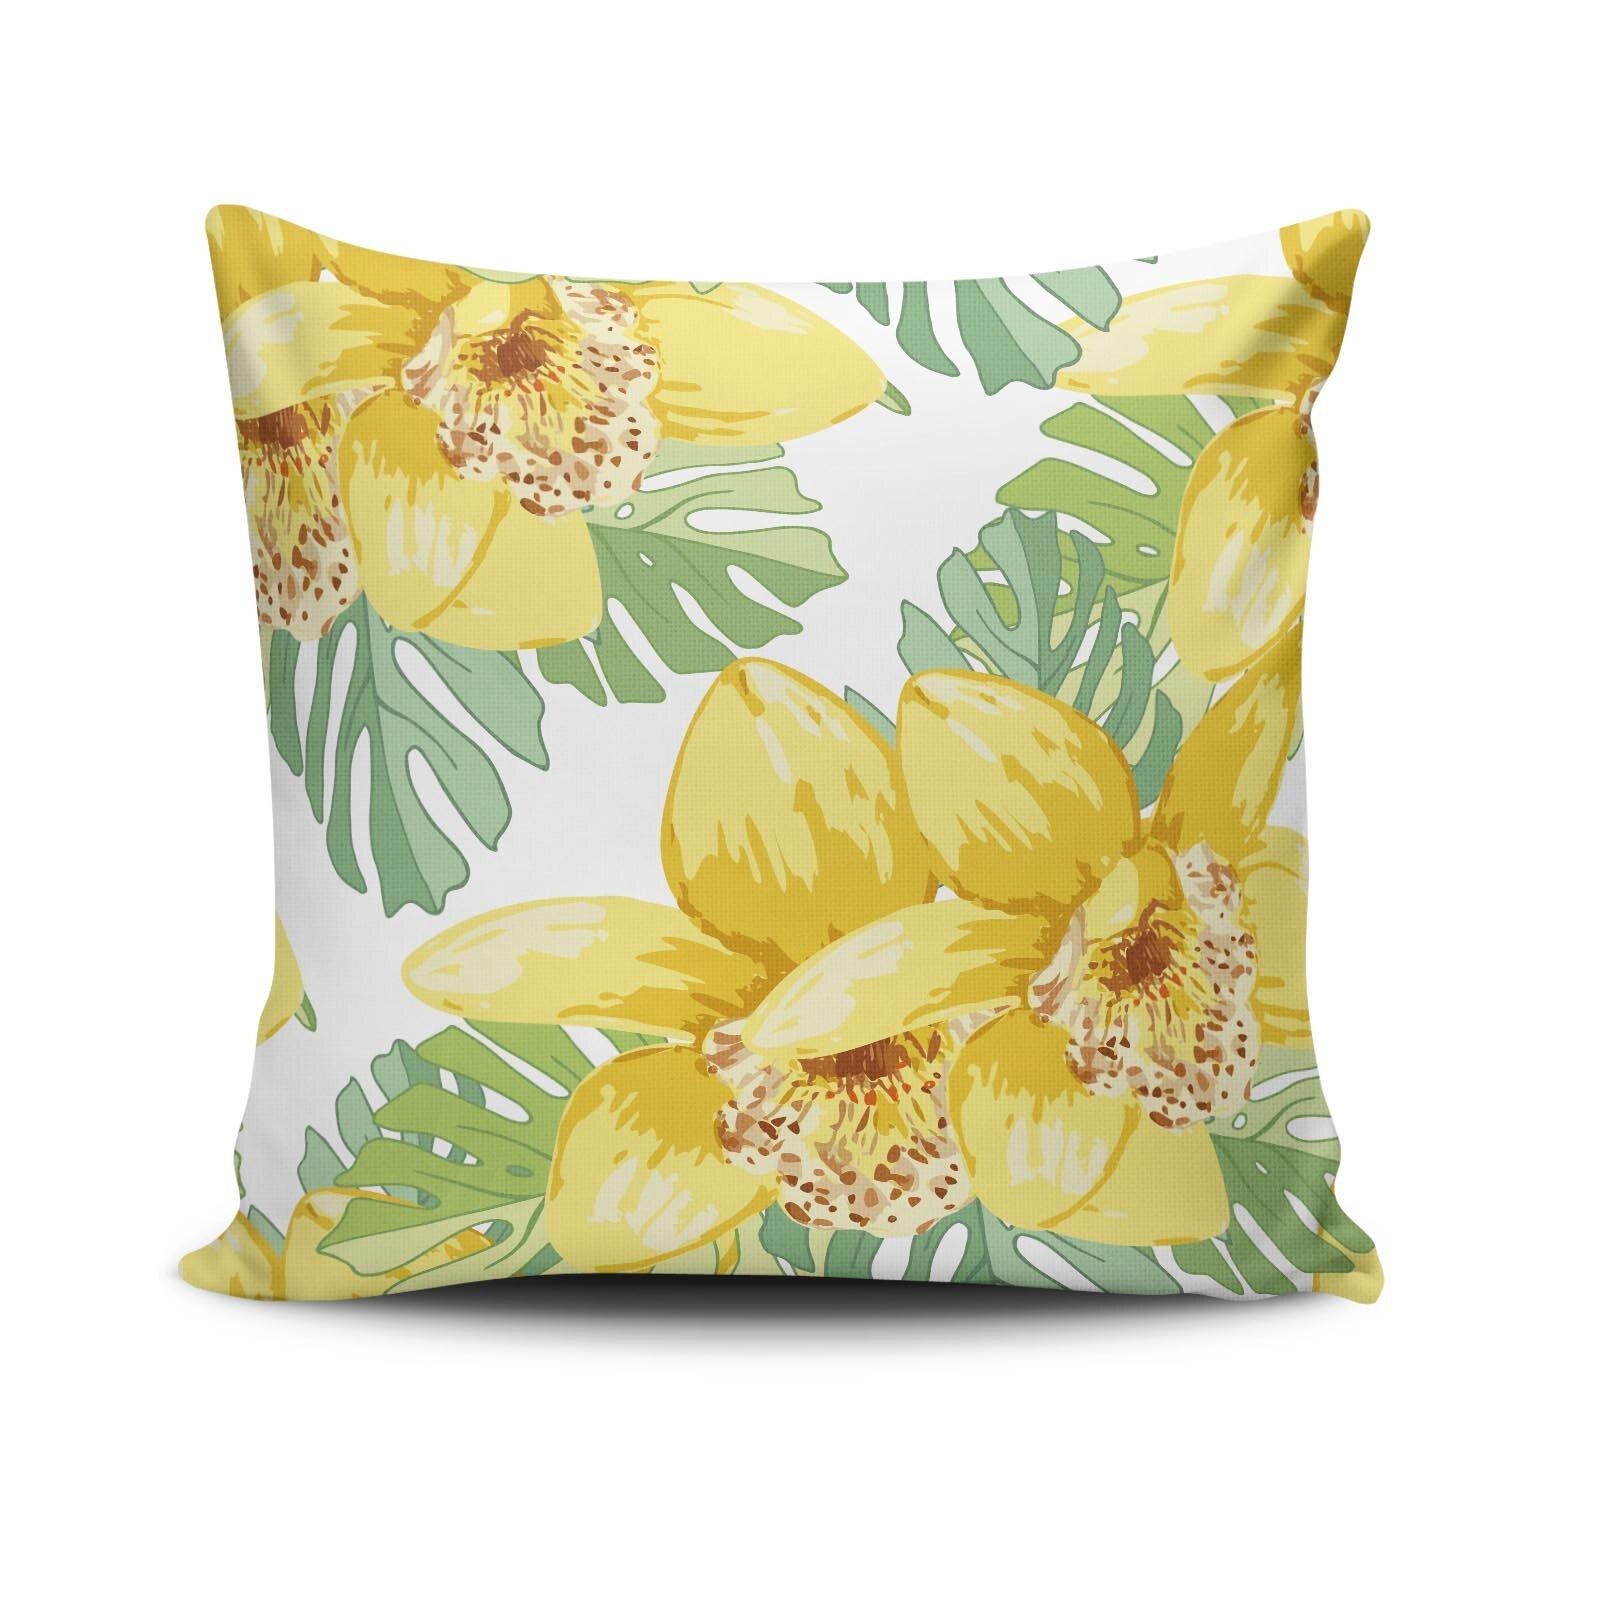 Perna decorativa Cushion Love, Dimensiune: 45 x 45 cm, Material exterior: 50% bumbac / 50% poliester 768CLV0129